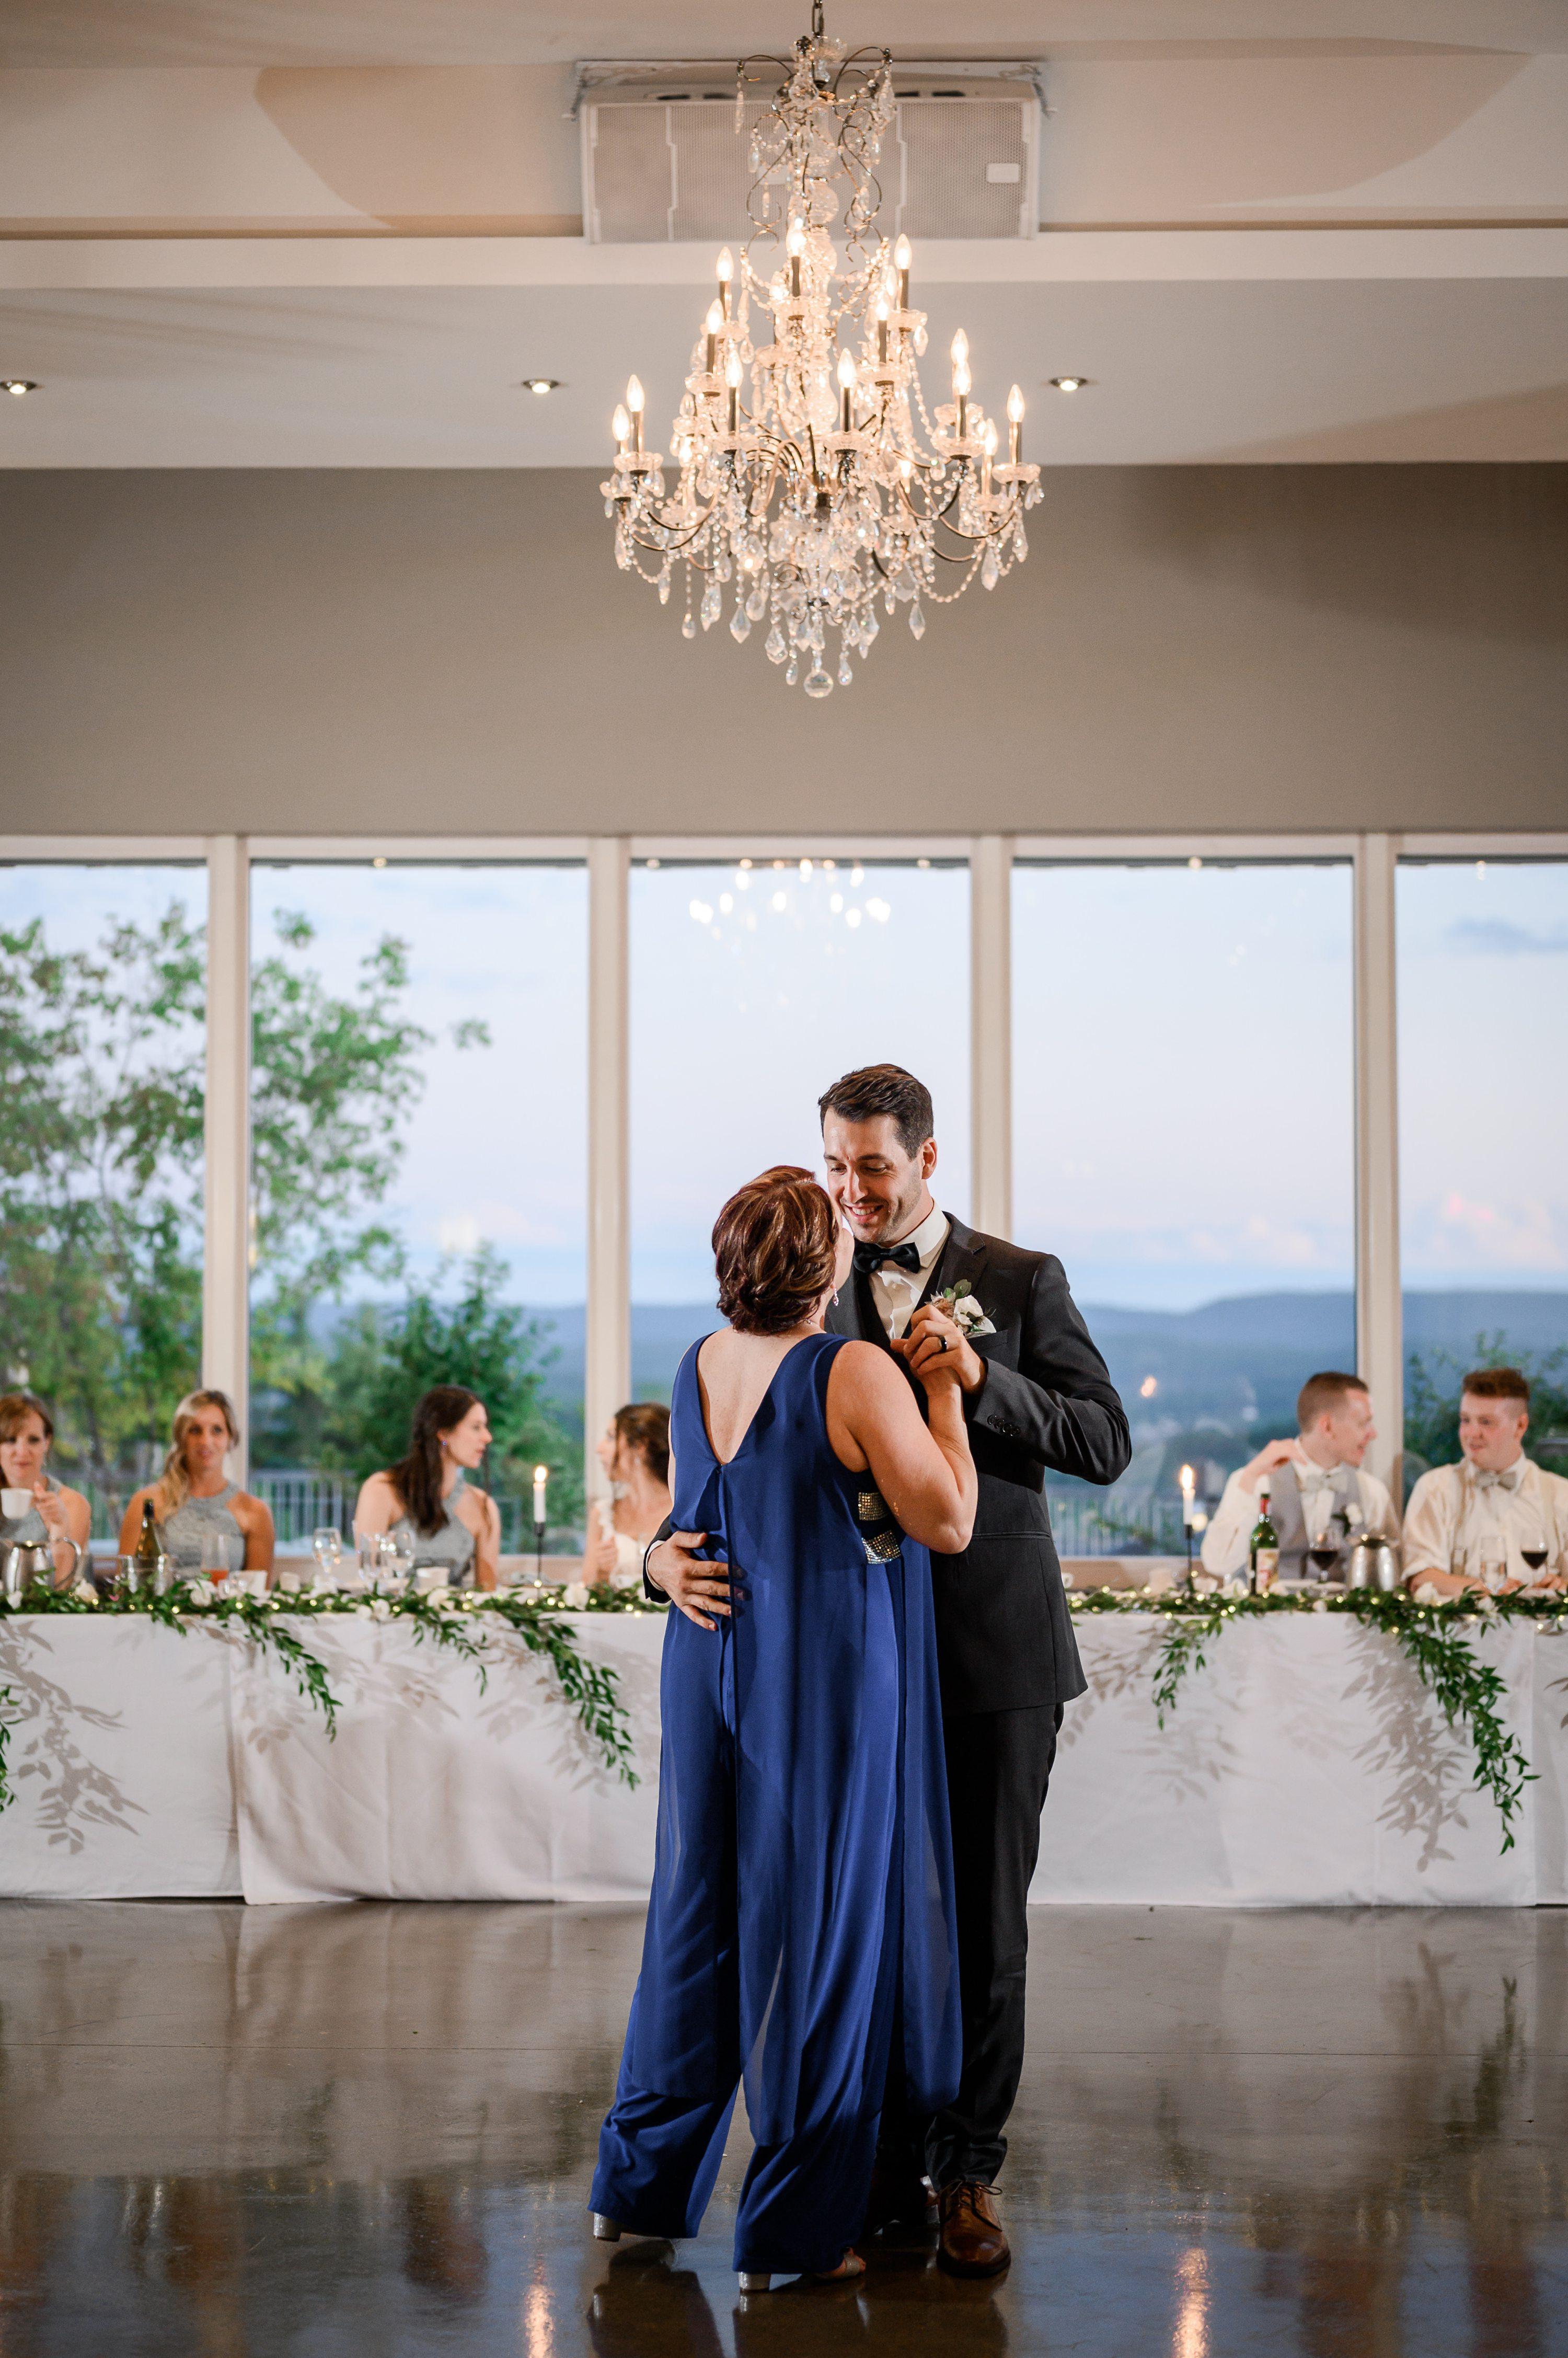 gazebo mariage,Photographe de mariage